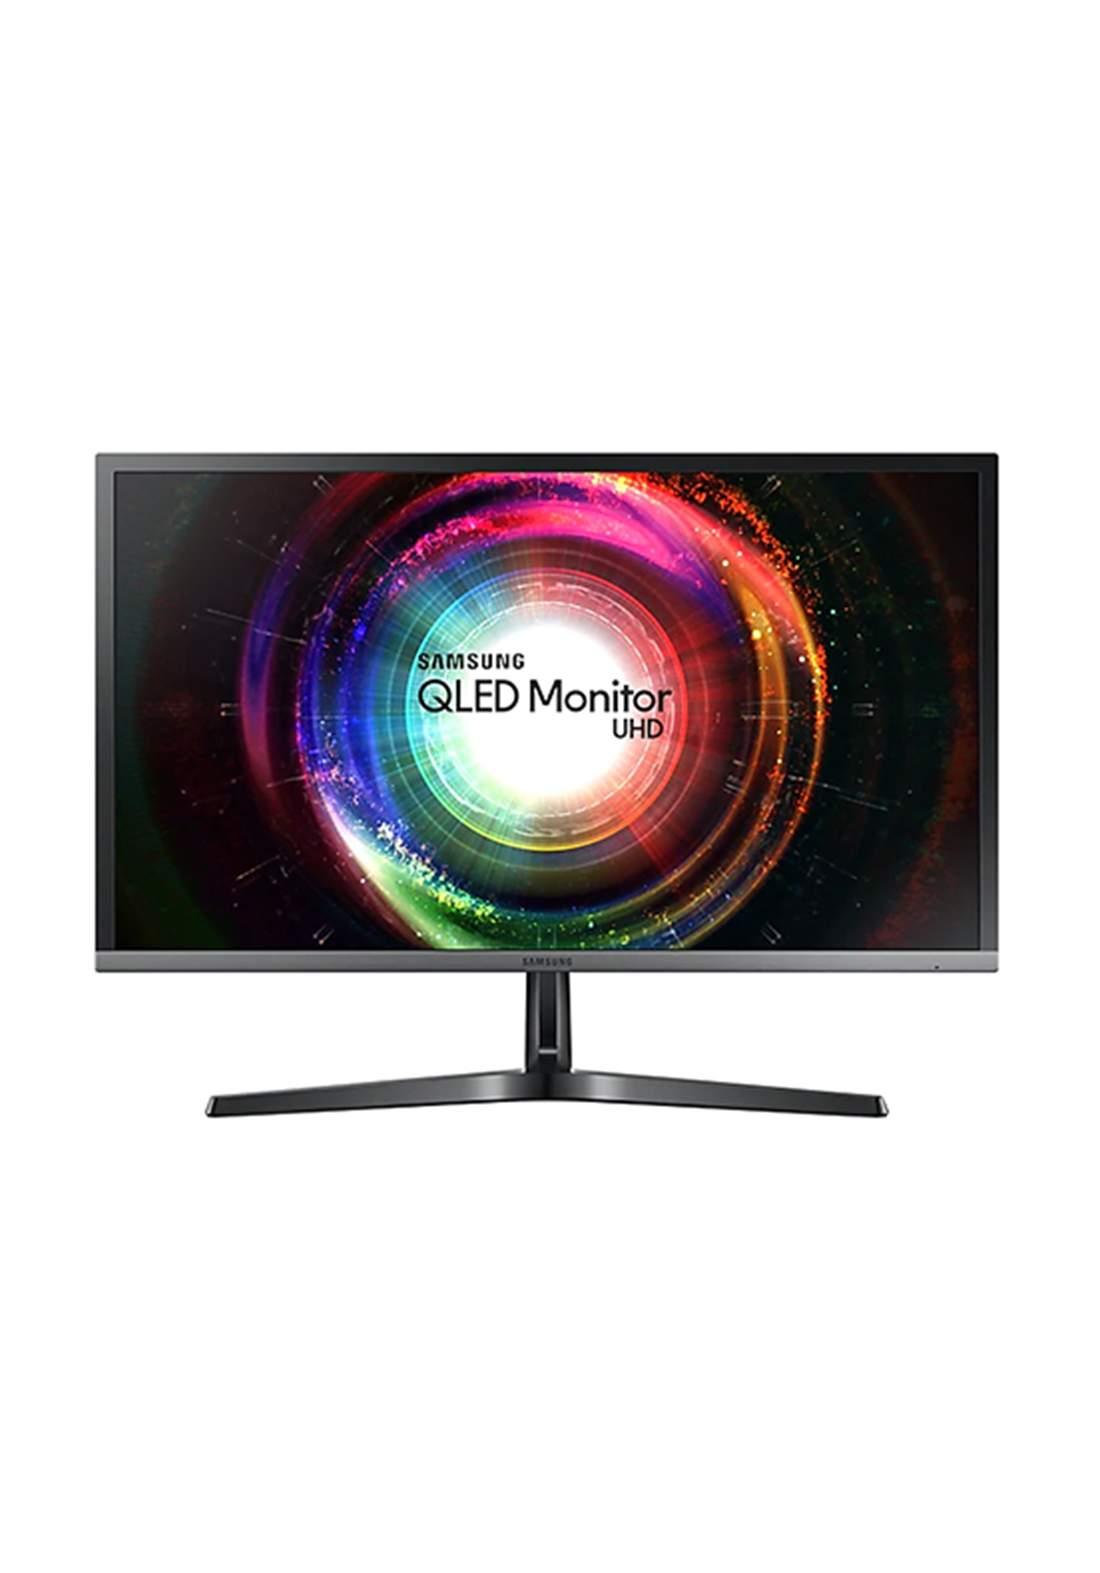 Samsung LED LU28H750UQM Curved Gaming Monitor UHD 28 - Black